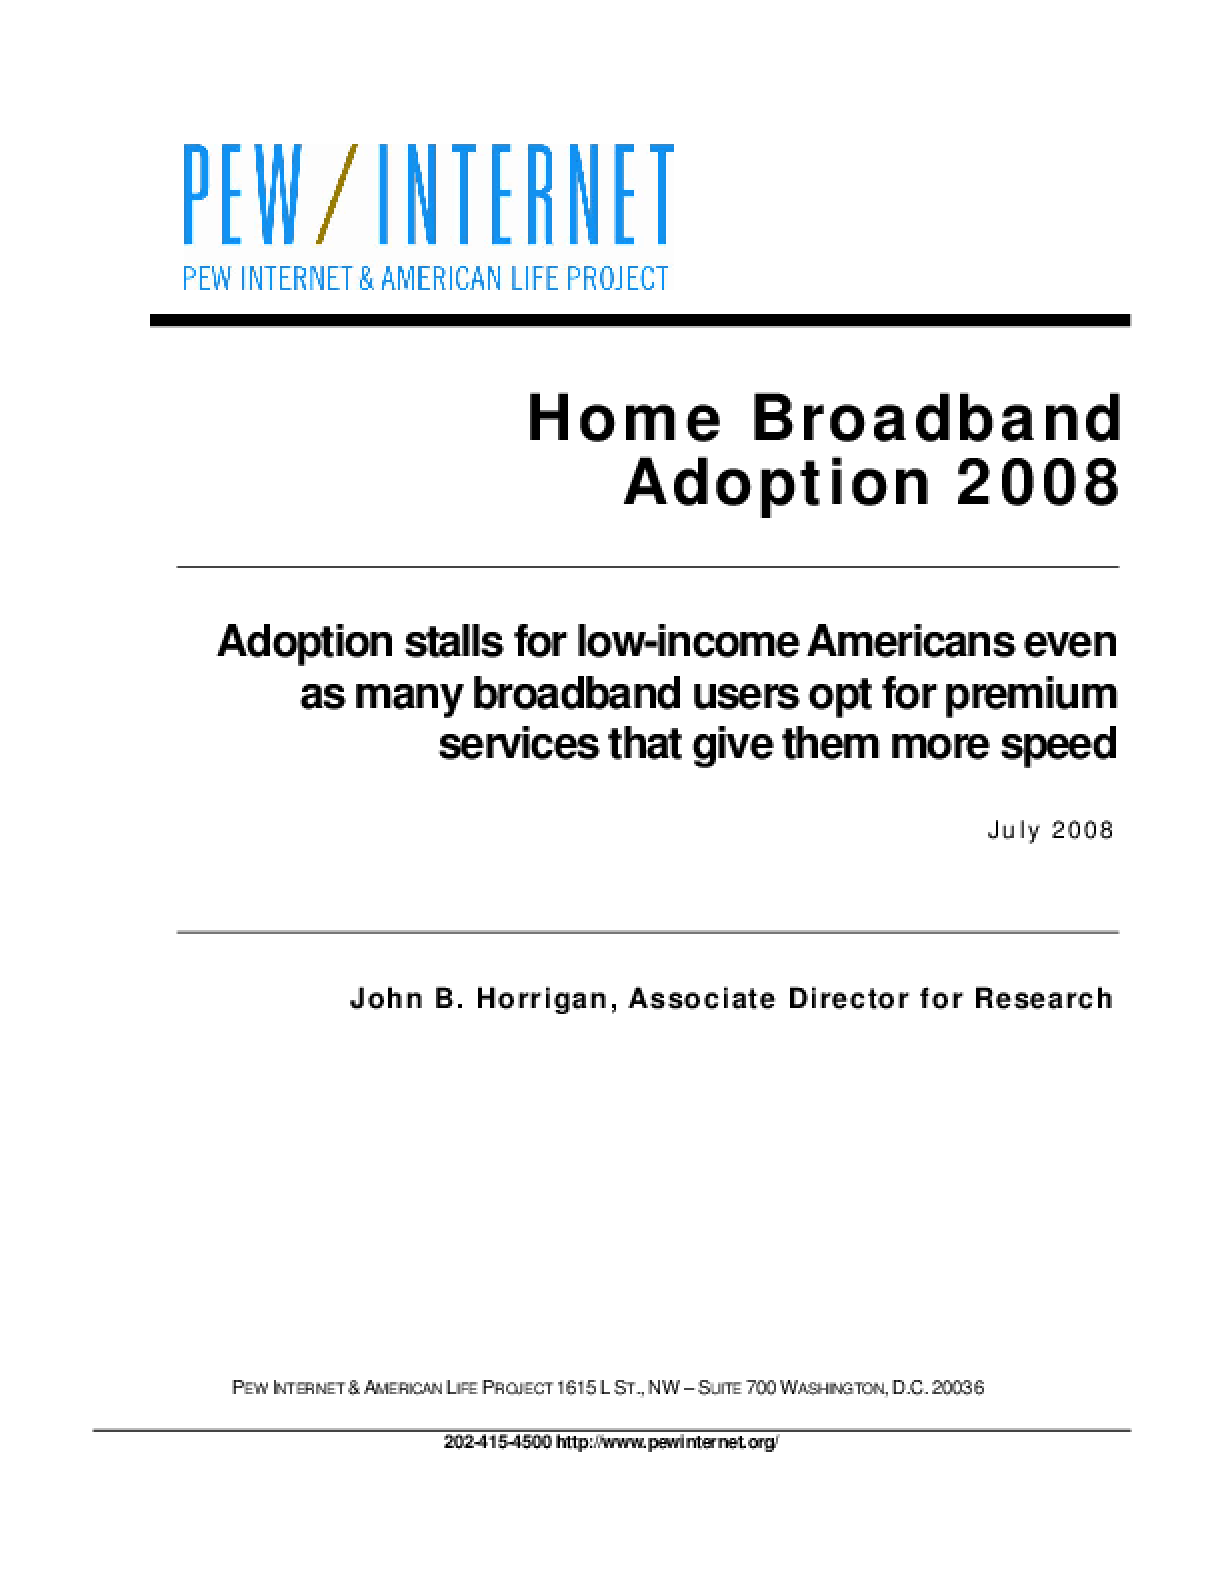 Home Broadband Adoption 2008